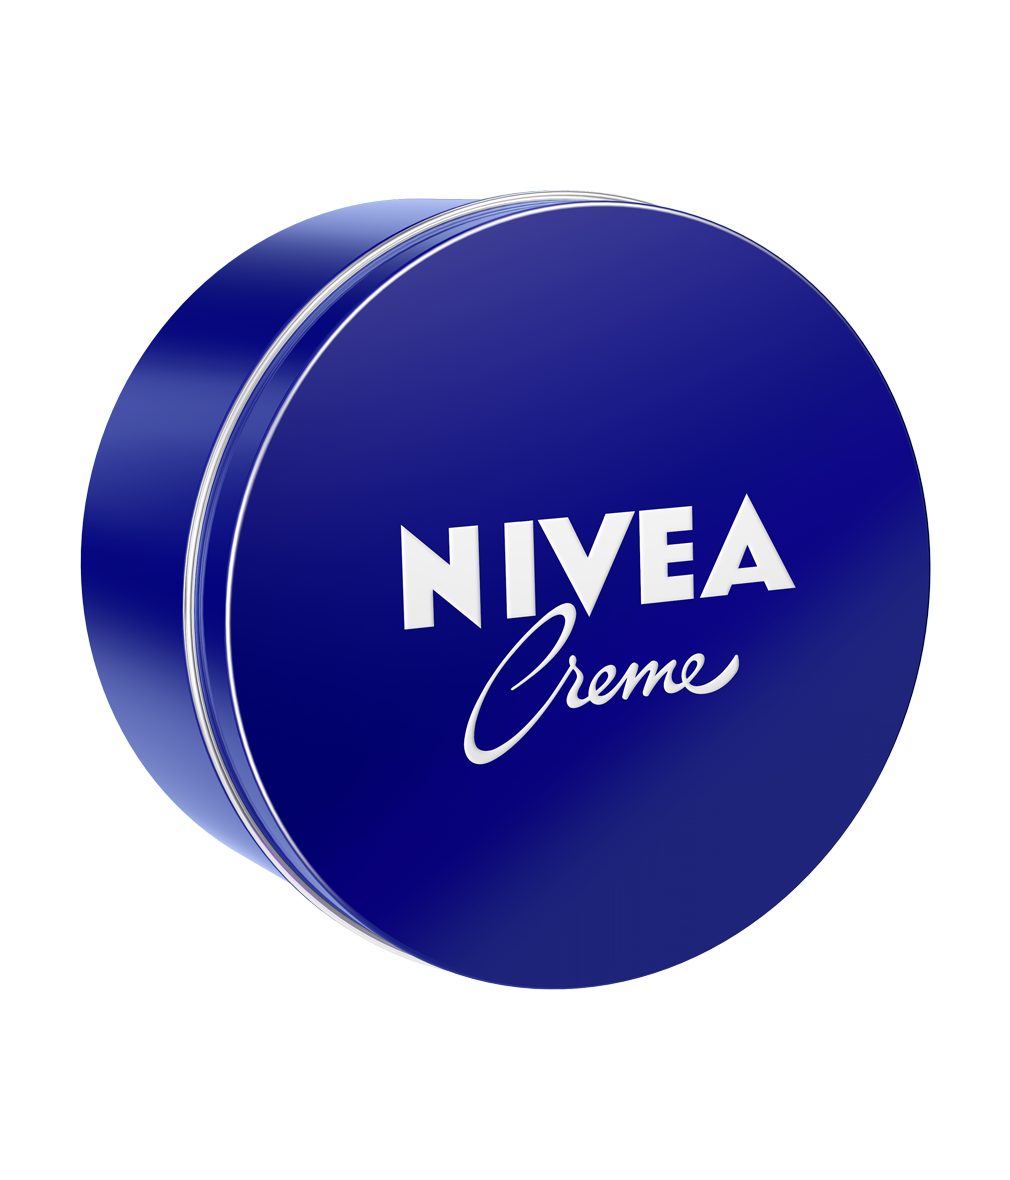 NIVEA Creme 400ml.